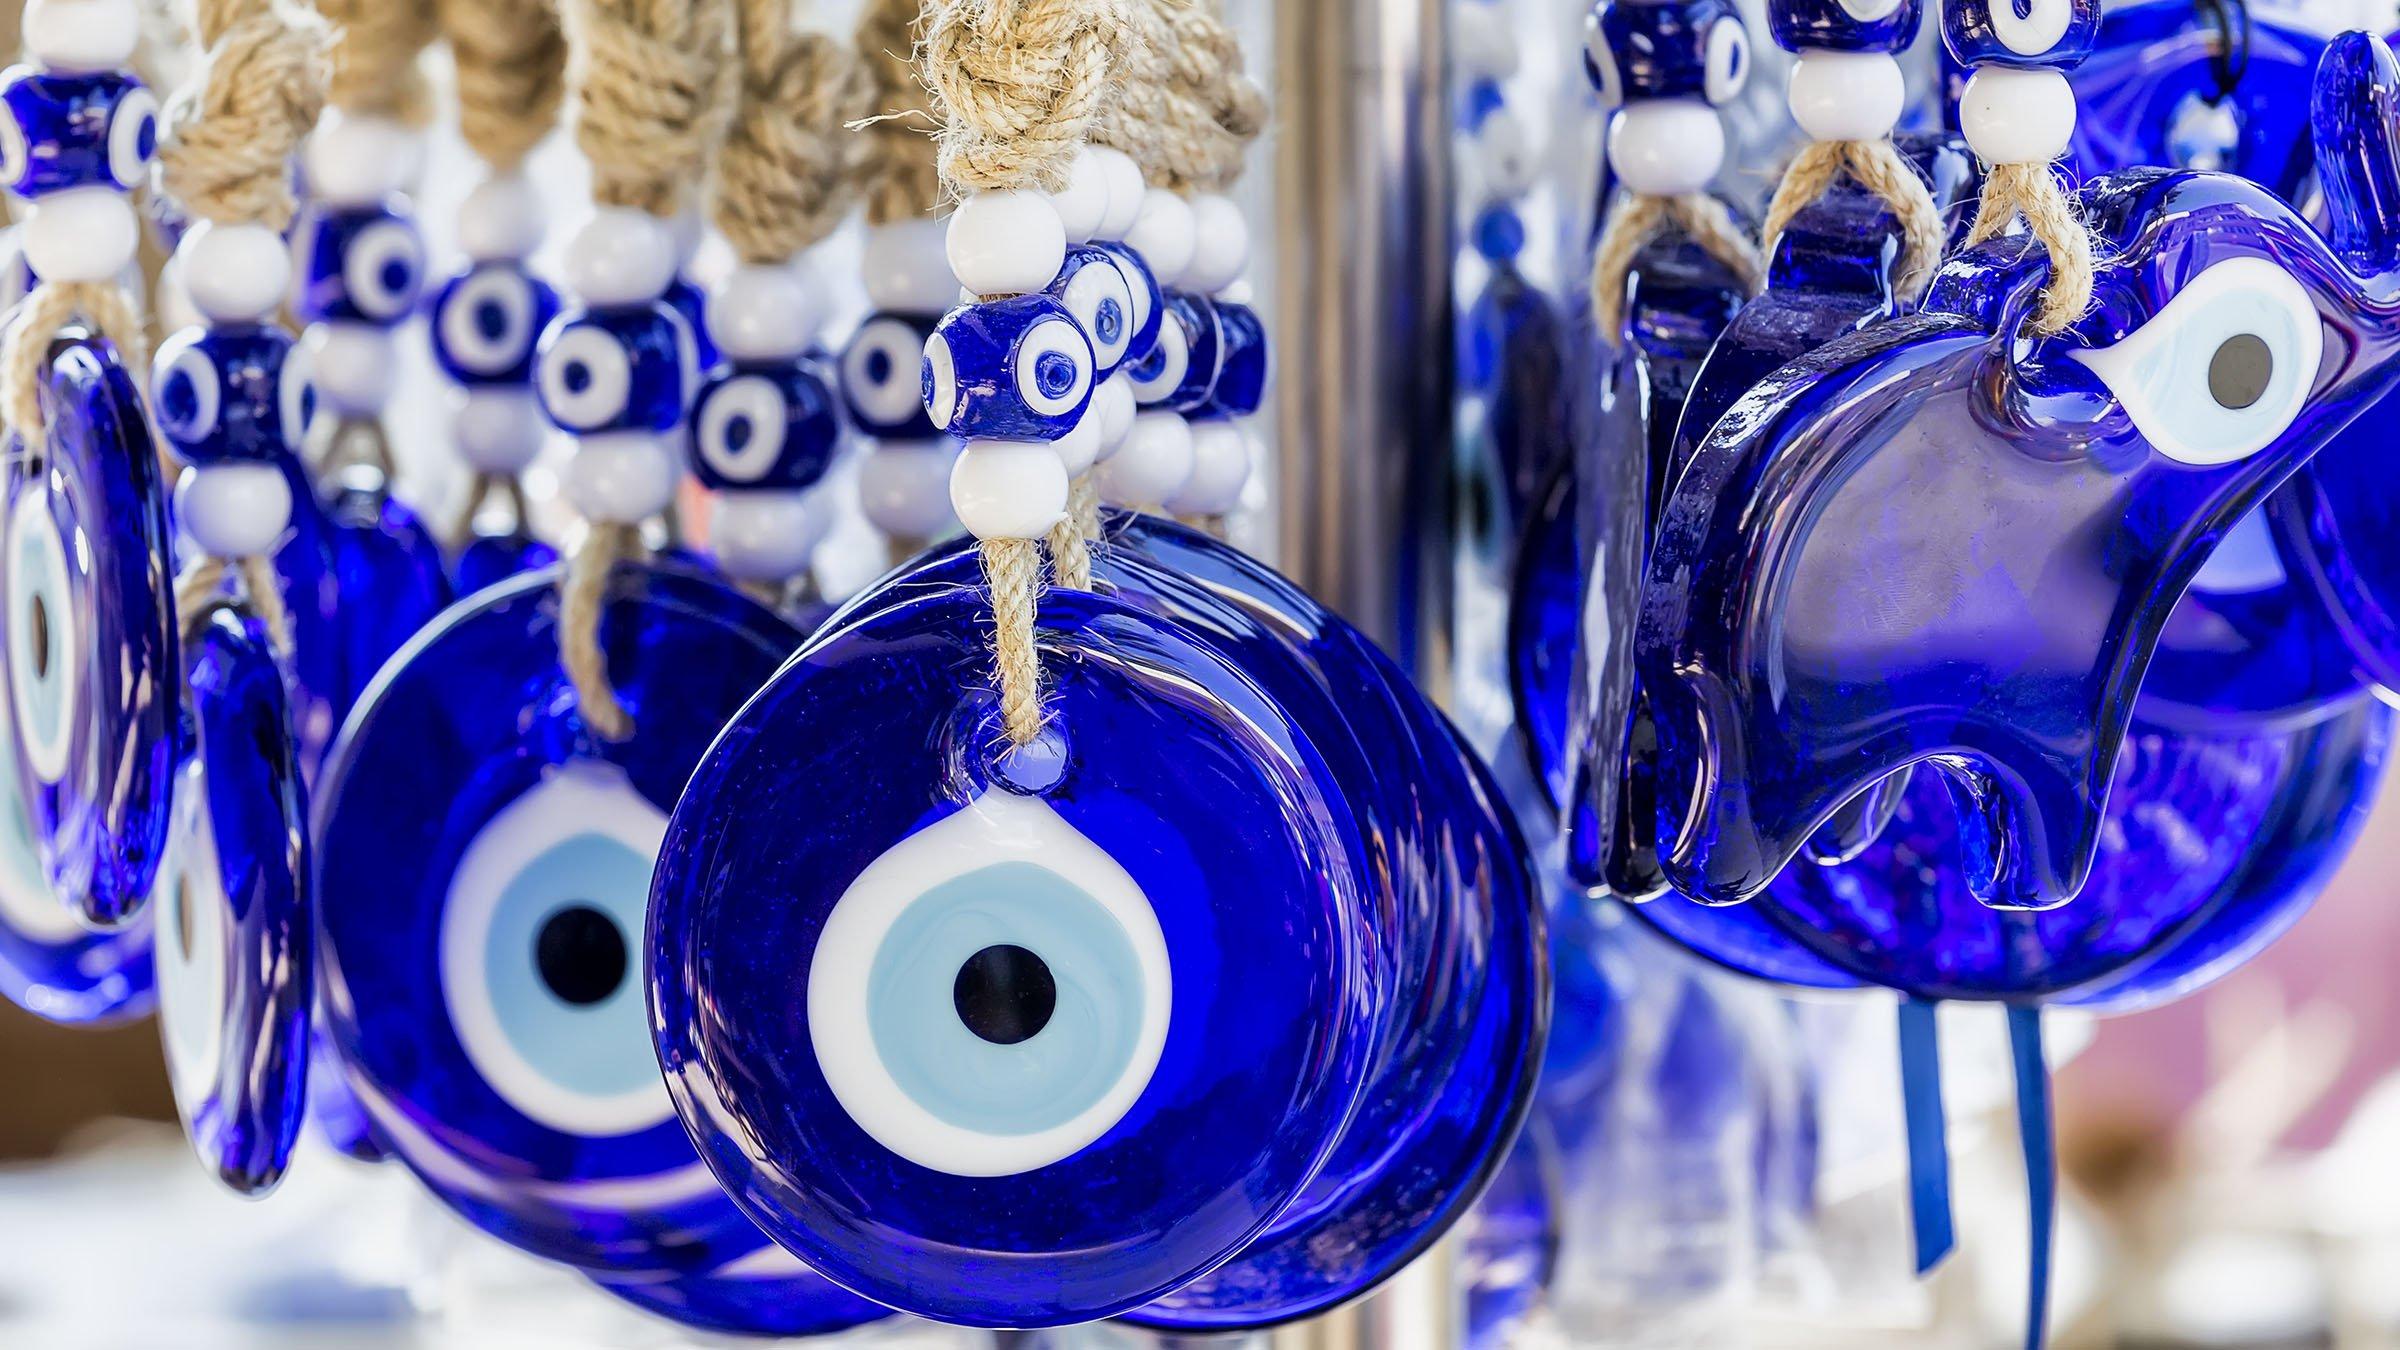 https://www.viajejet.com/wp-content/viajes/el-amuleto-griego-contra-el-mal-de-ojo.jpg